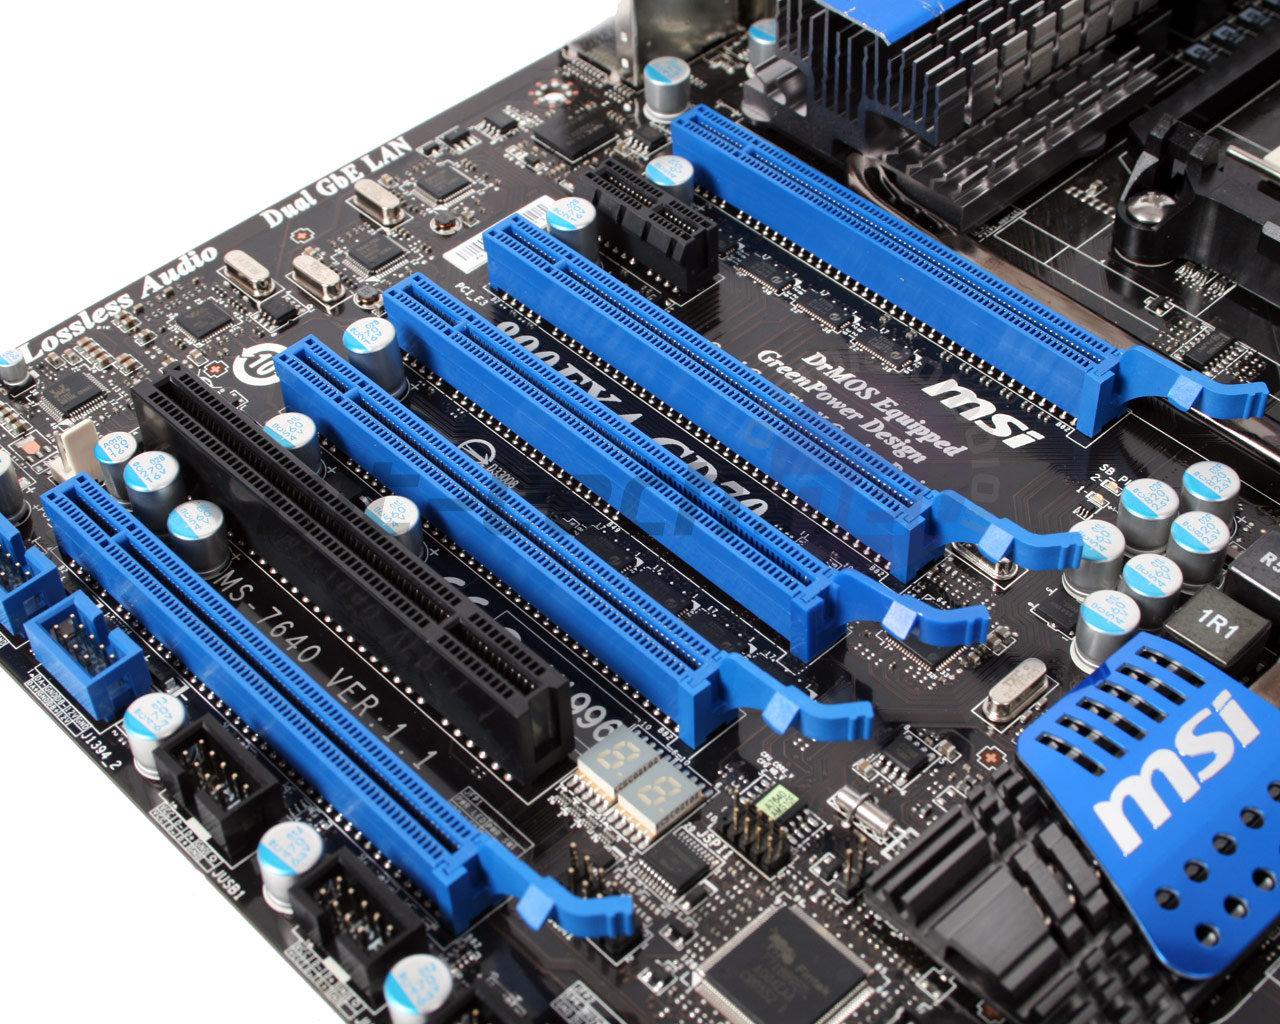 MSI 890FX-GD70